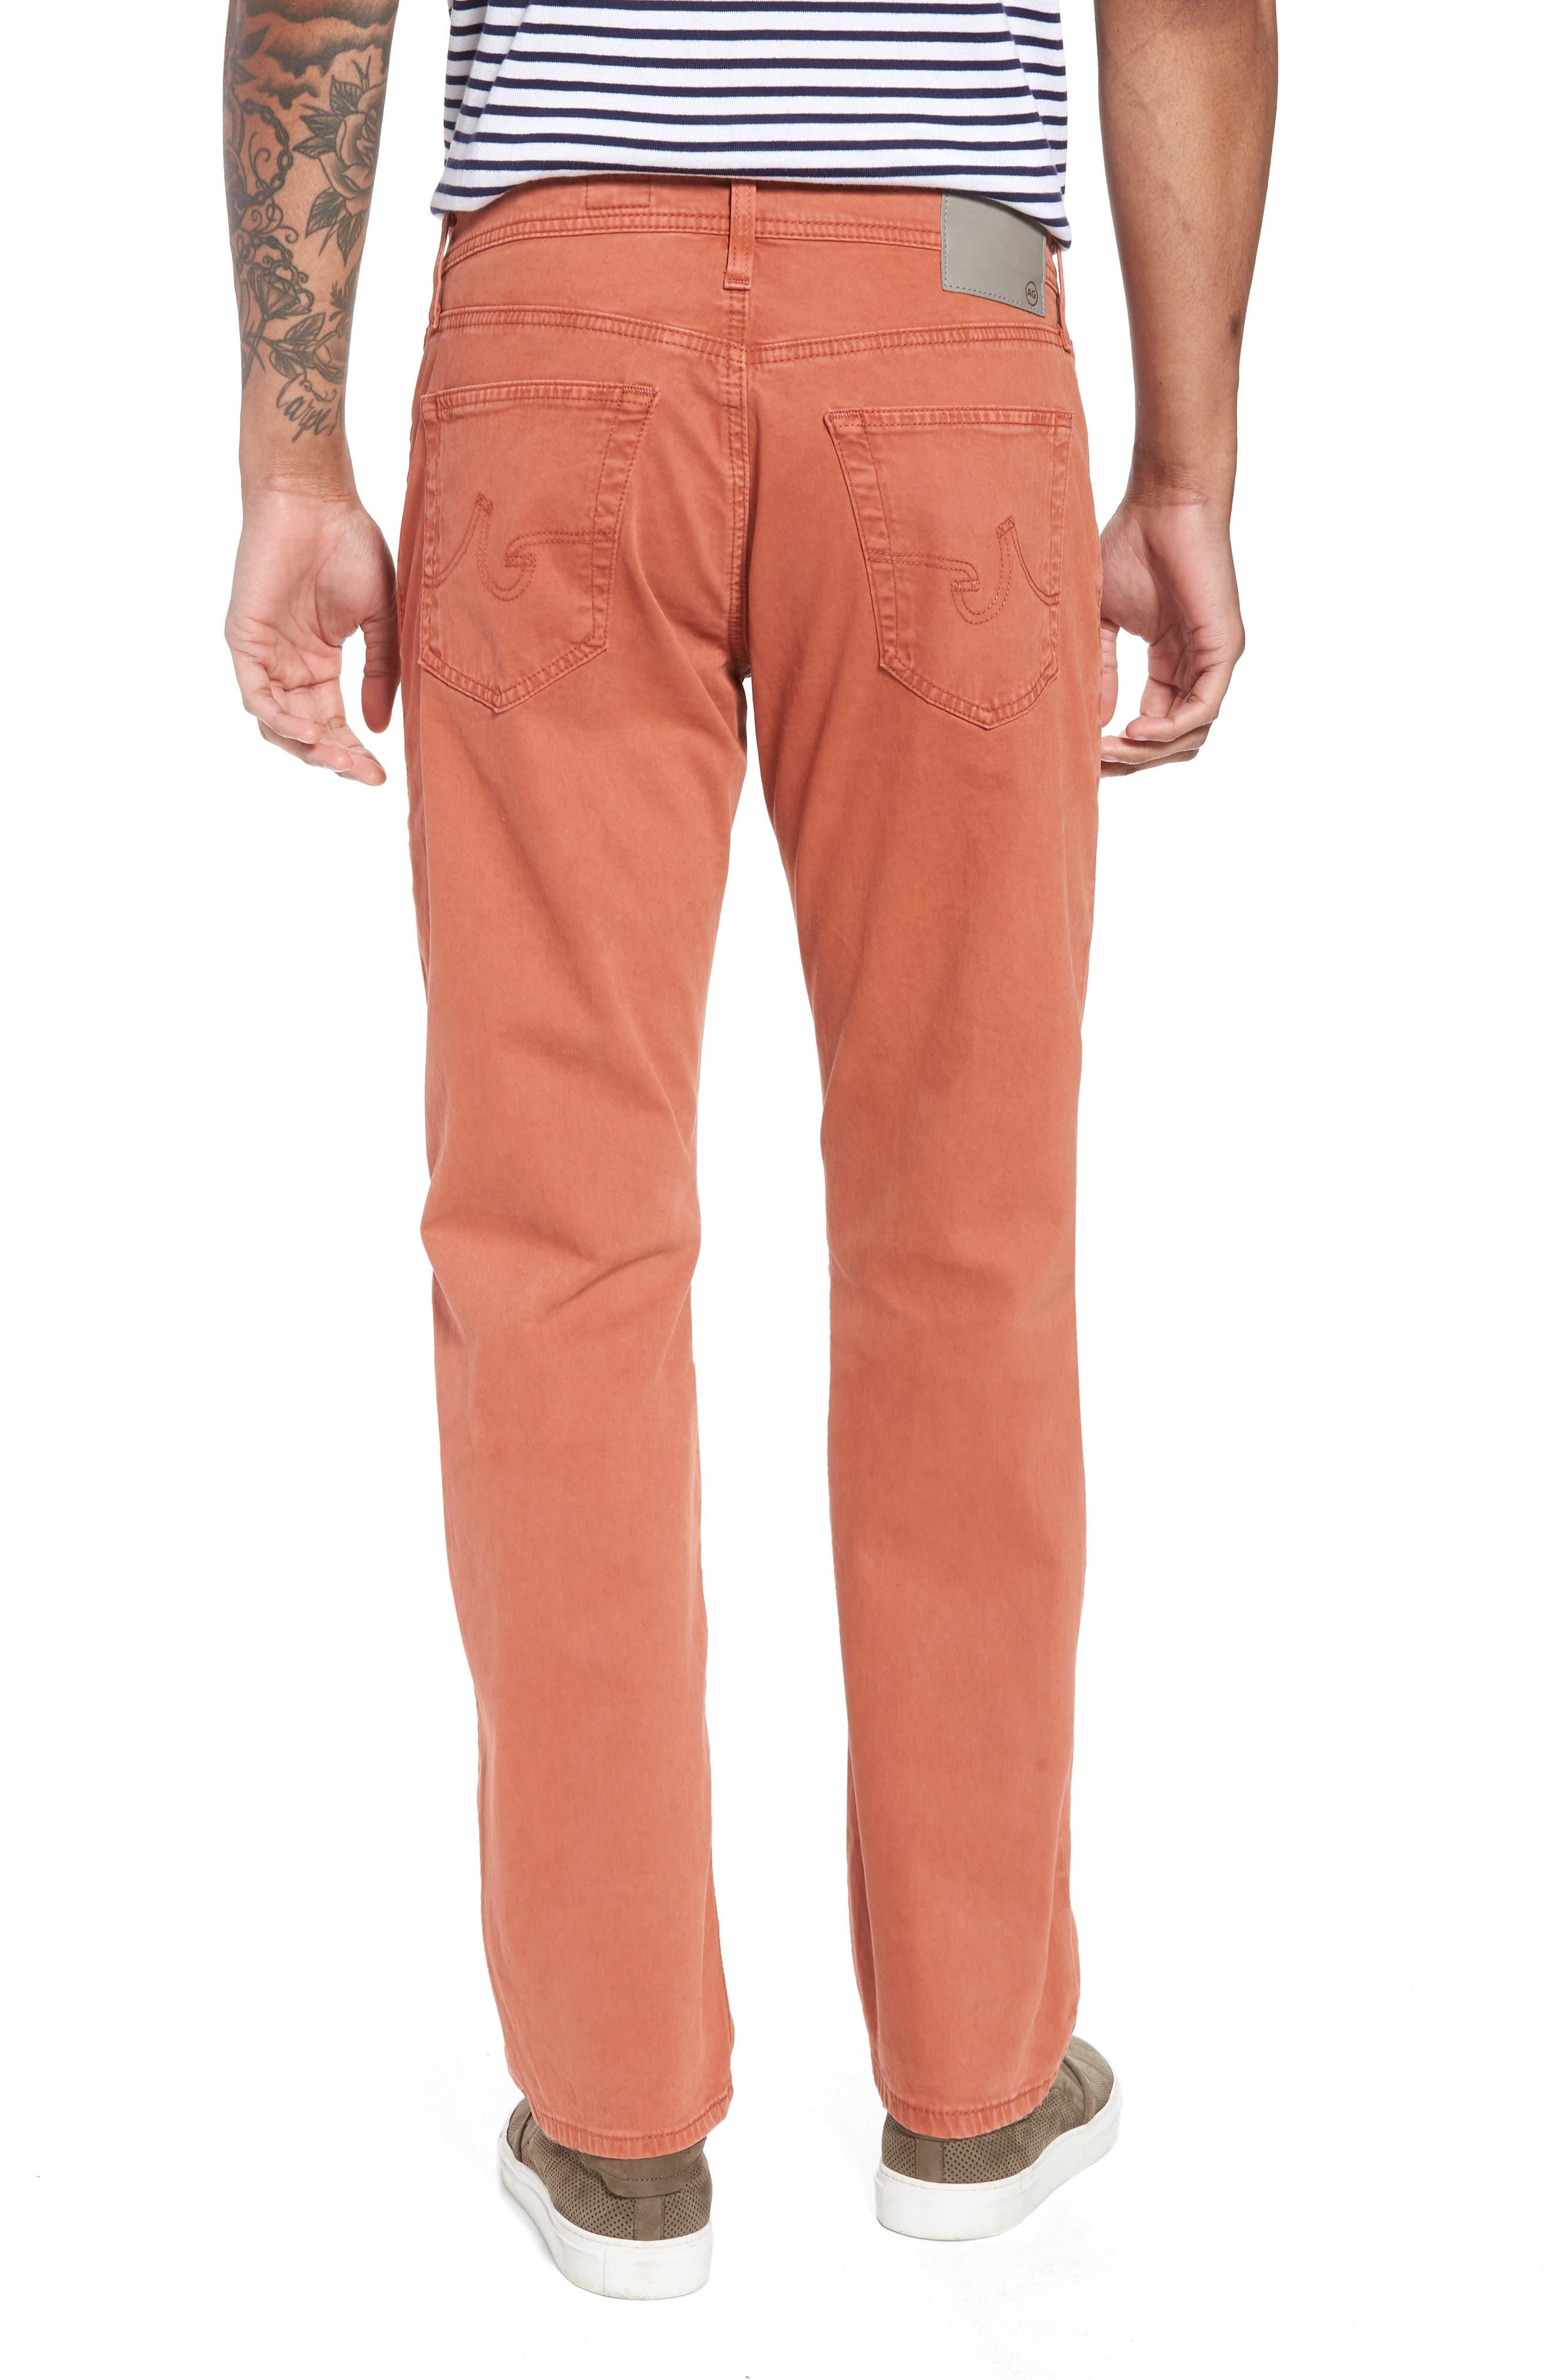 Graduate SUD Slim Straight Leg Pants,                             Alternate thumbnail 2, color,                             Sulfur Rosso Red